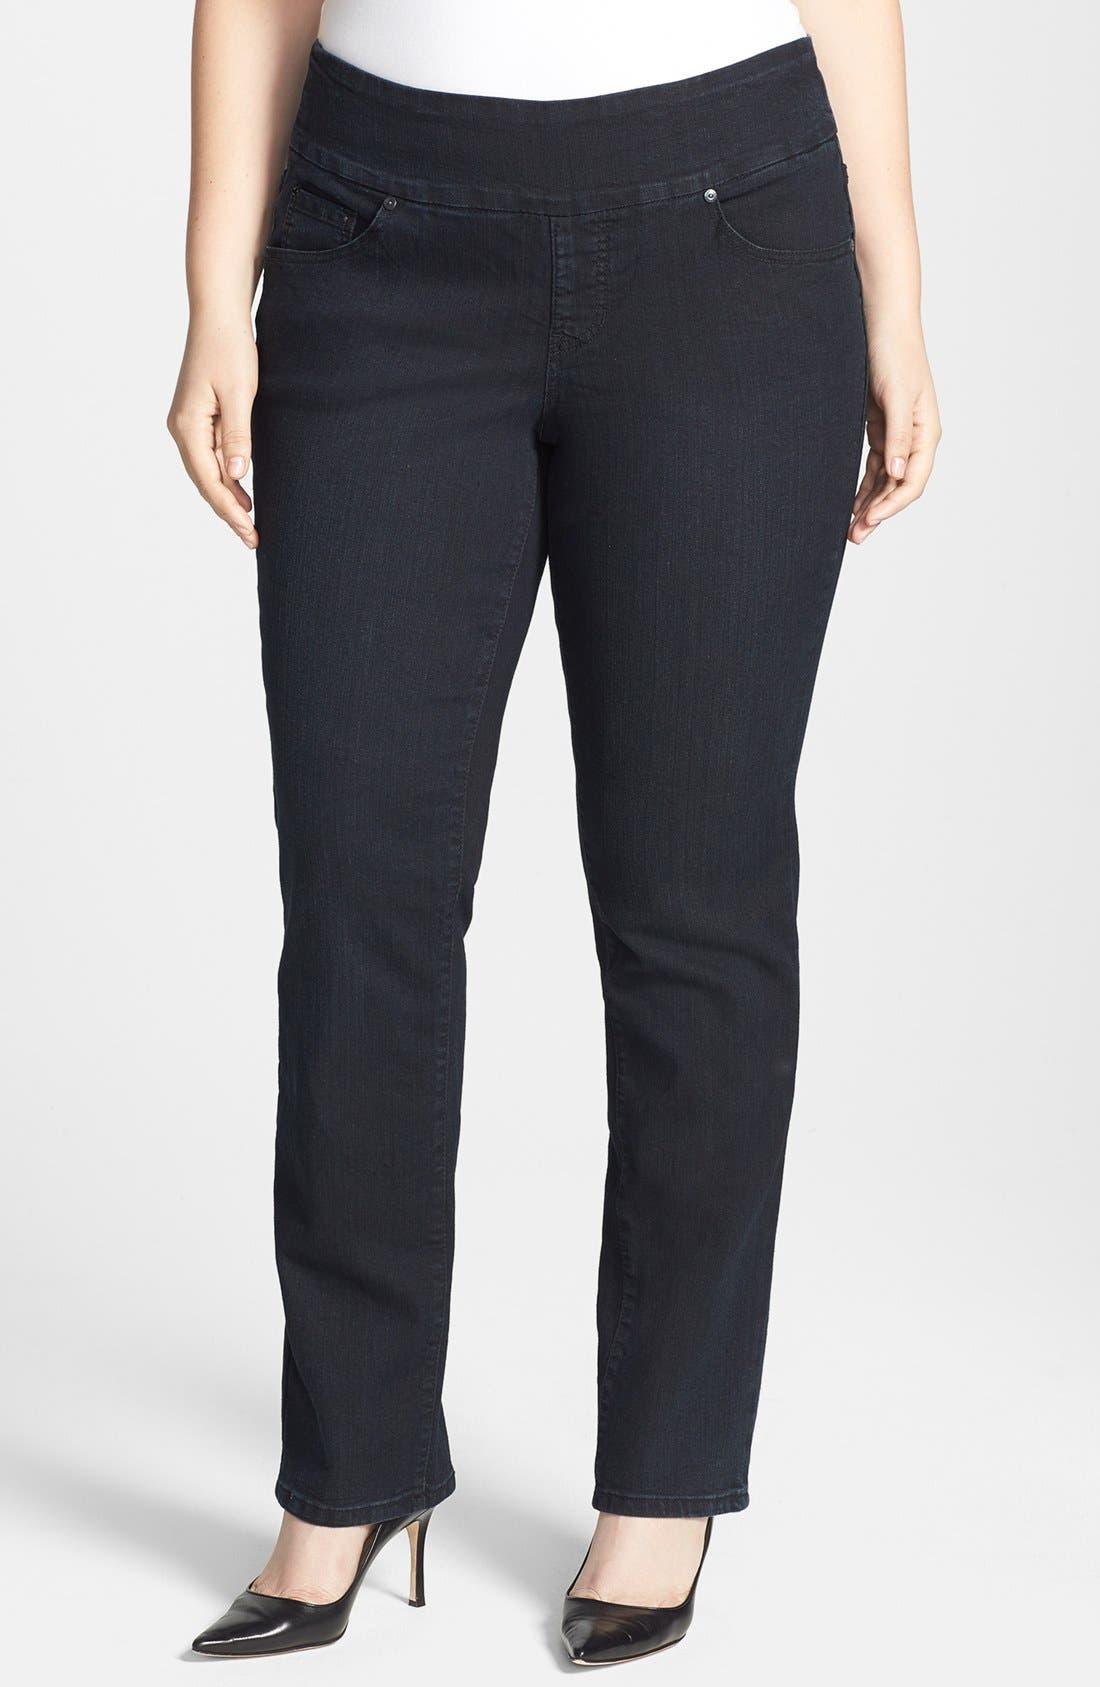 Main Image - Jag Jeans 'Mila' Embellished Back Pocket Pull-On Straight Leg Jeans (Plus Size)